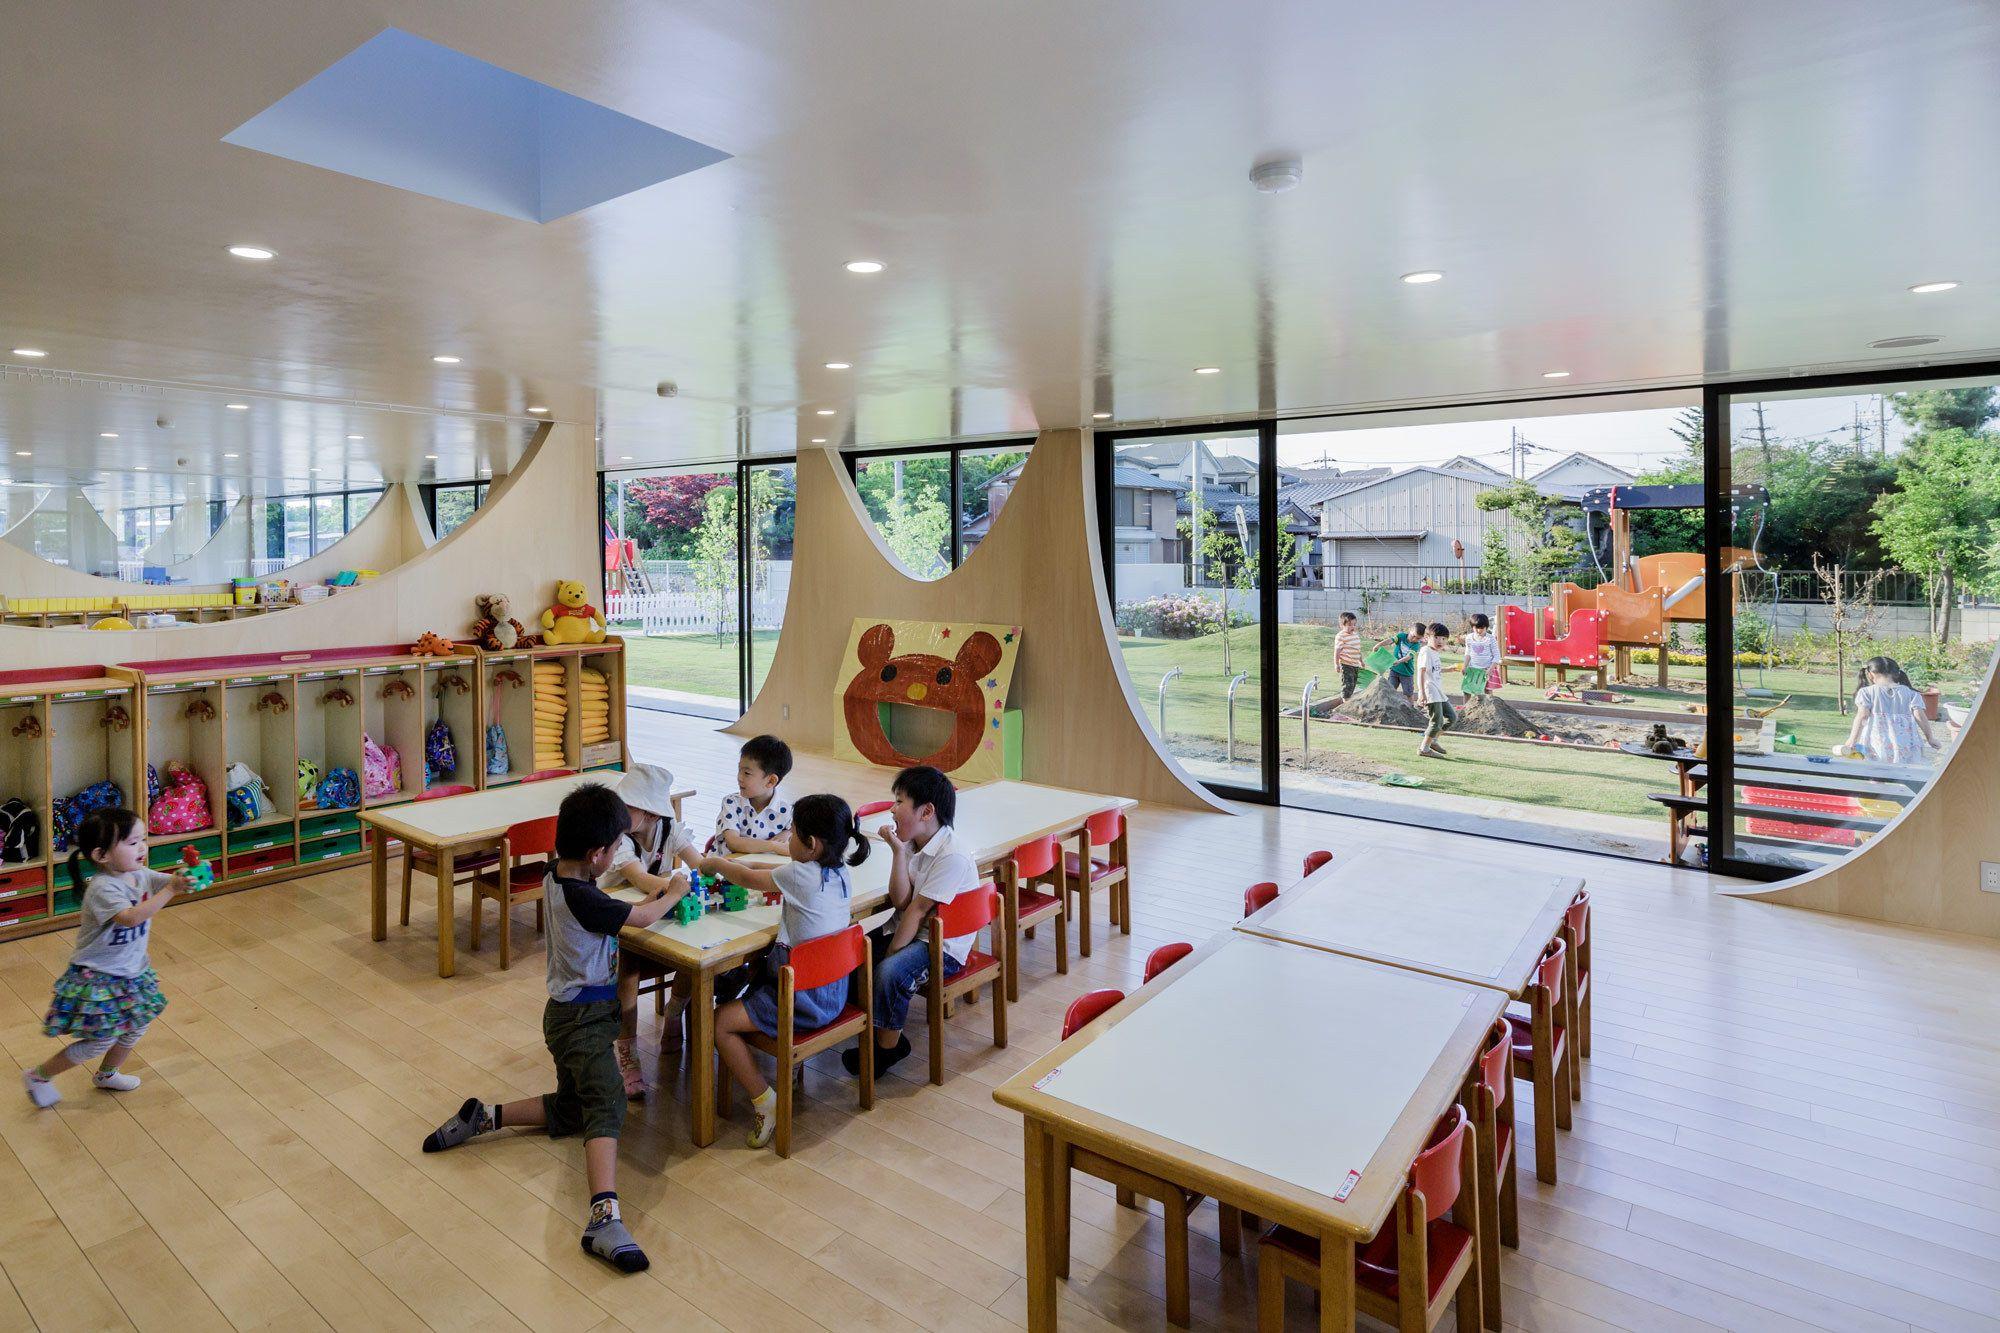 Dorf innenarchitektur spielen im garten  kindergarten in saitama  mermaid preschool edu